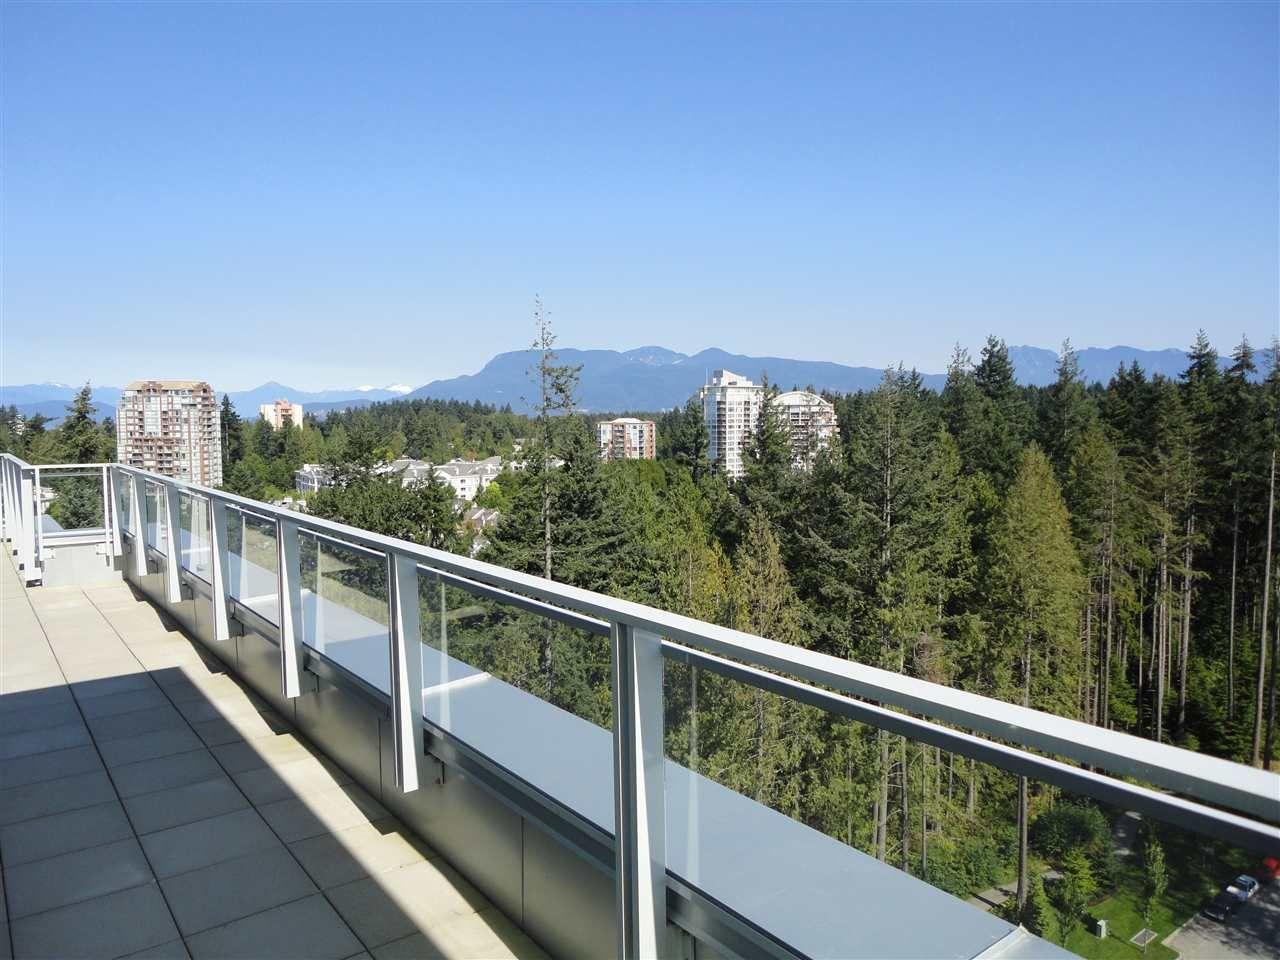 "Photo 11: Photos: 1600 5838 BERTON Avenue in Vancouver: University VW Condo for sale in ""WESBROOK"" (Vancouver West)  : MLS®# R2239956"